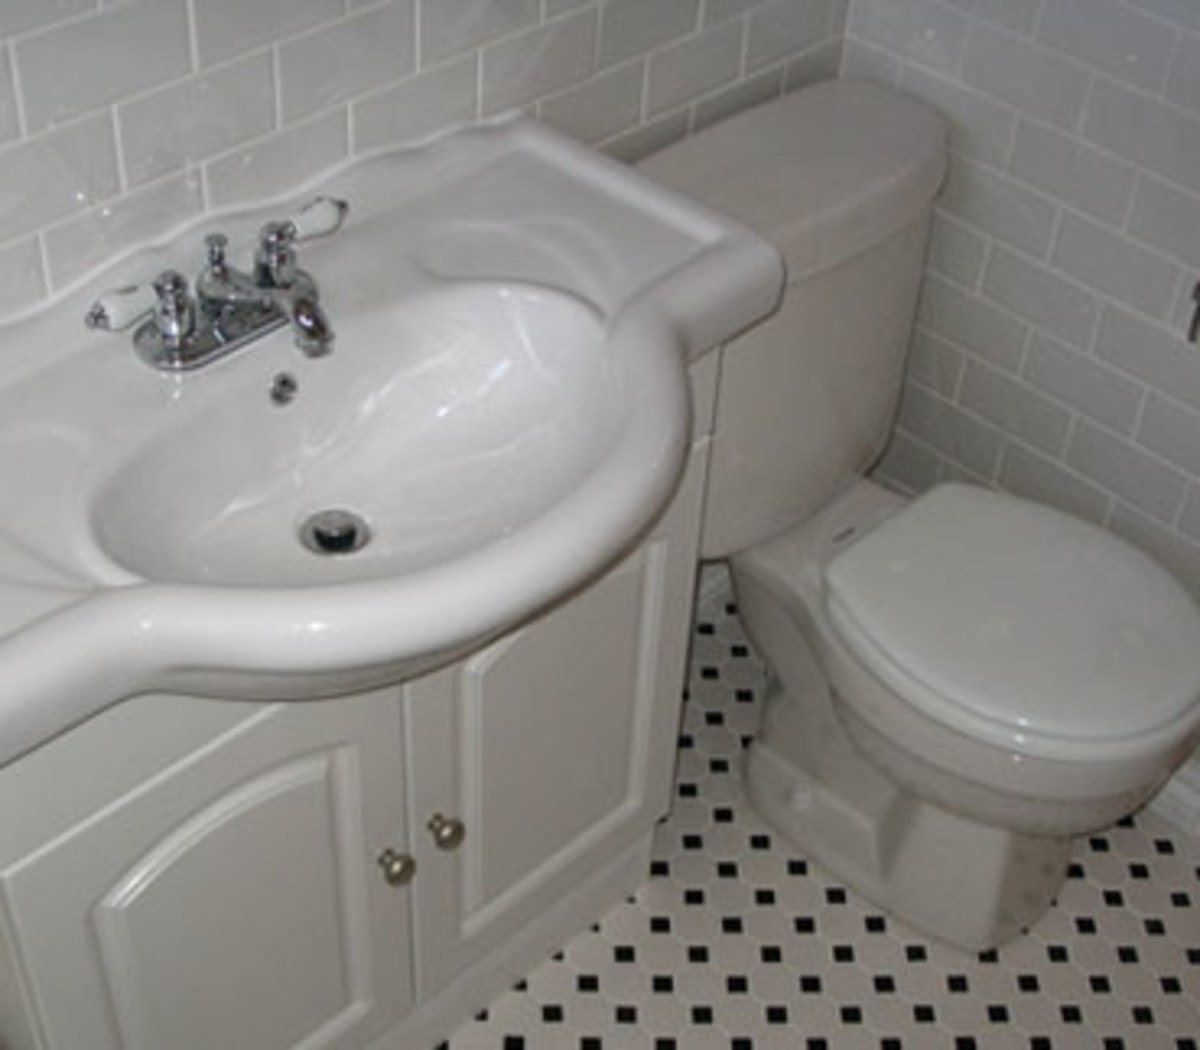 Lean Profile Vanity Saves Space In Small Bathroom